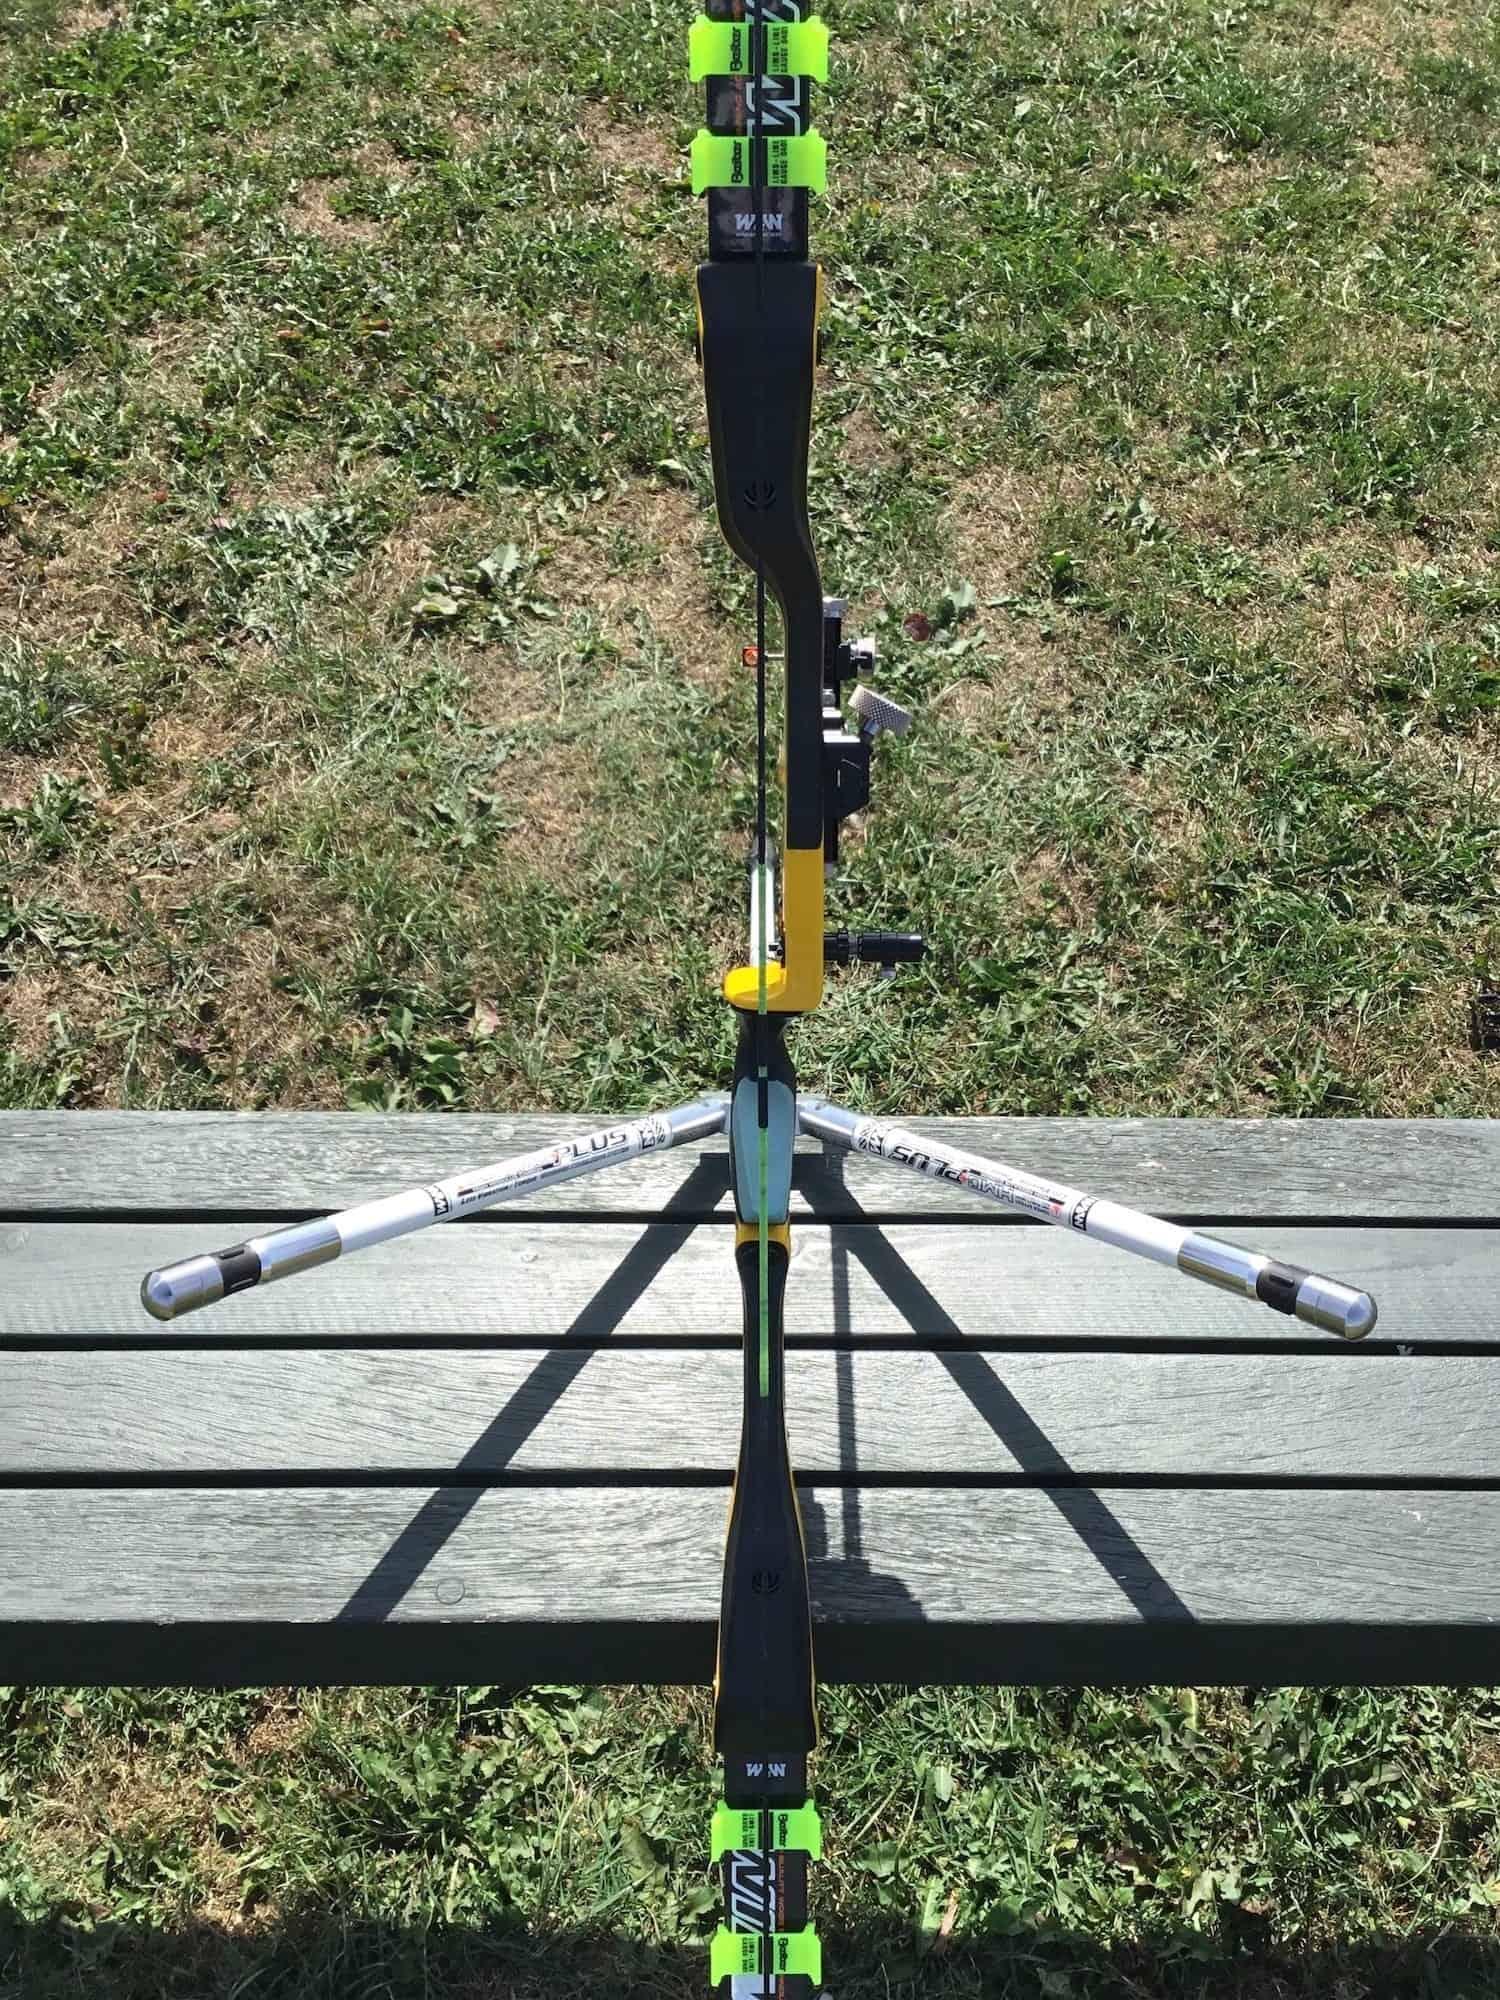 Good recurve limb alignment with a W&W TFT riser